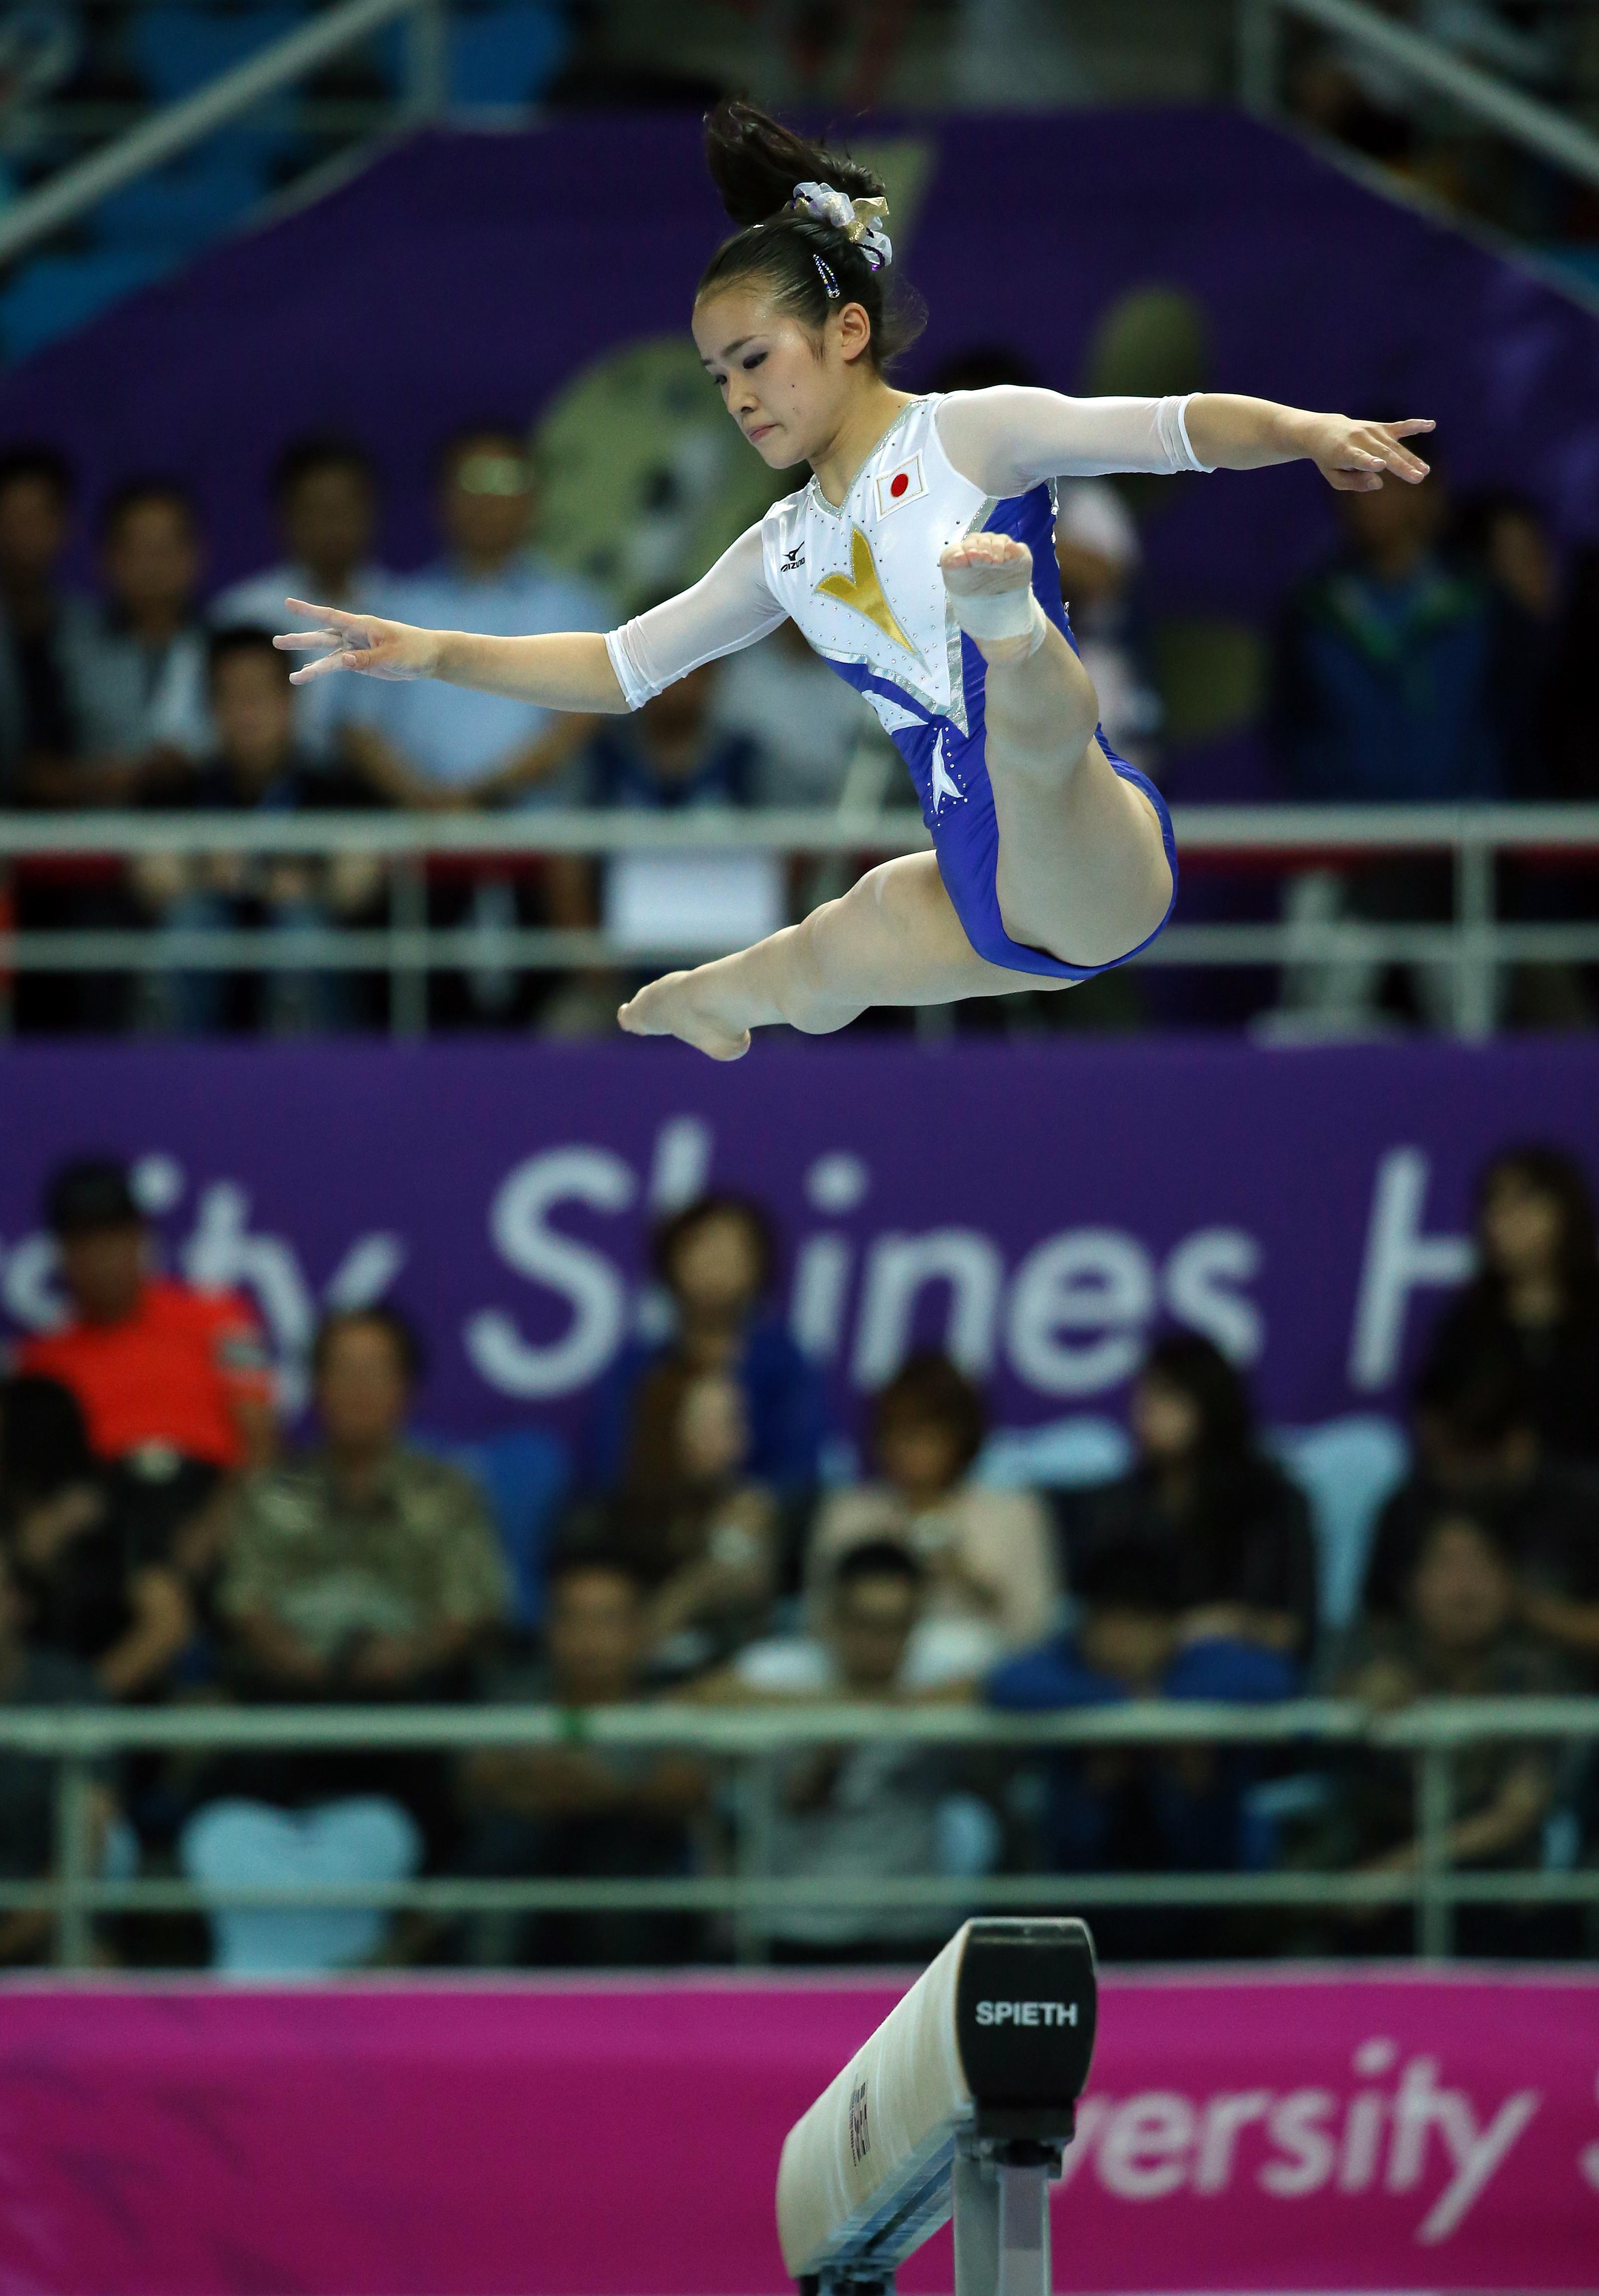 Asian Games Gymnastics 17